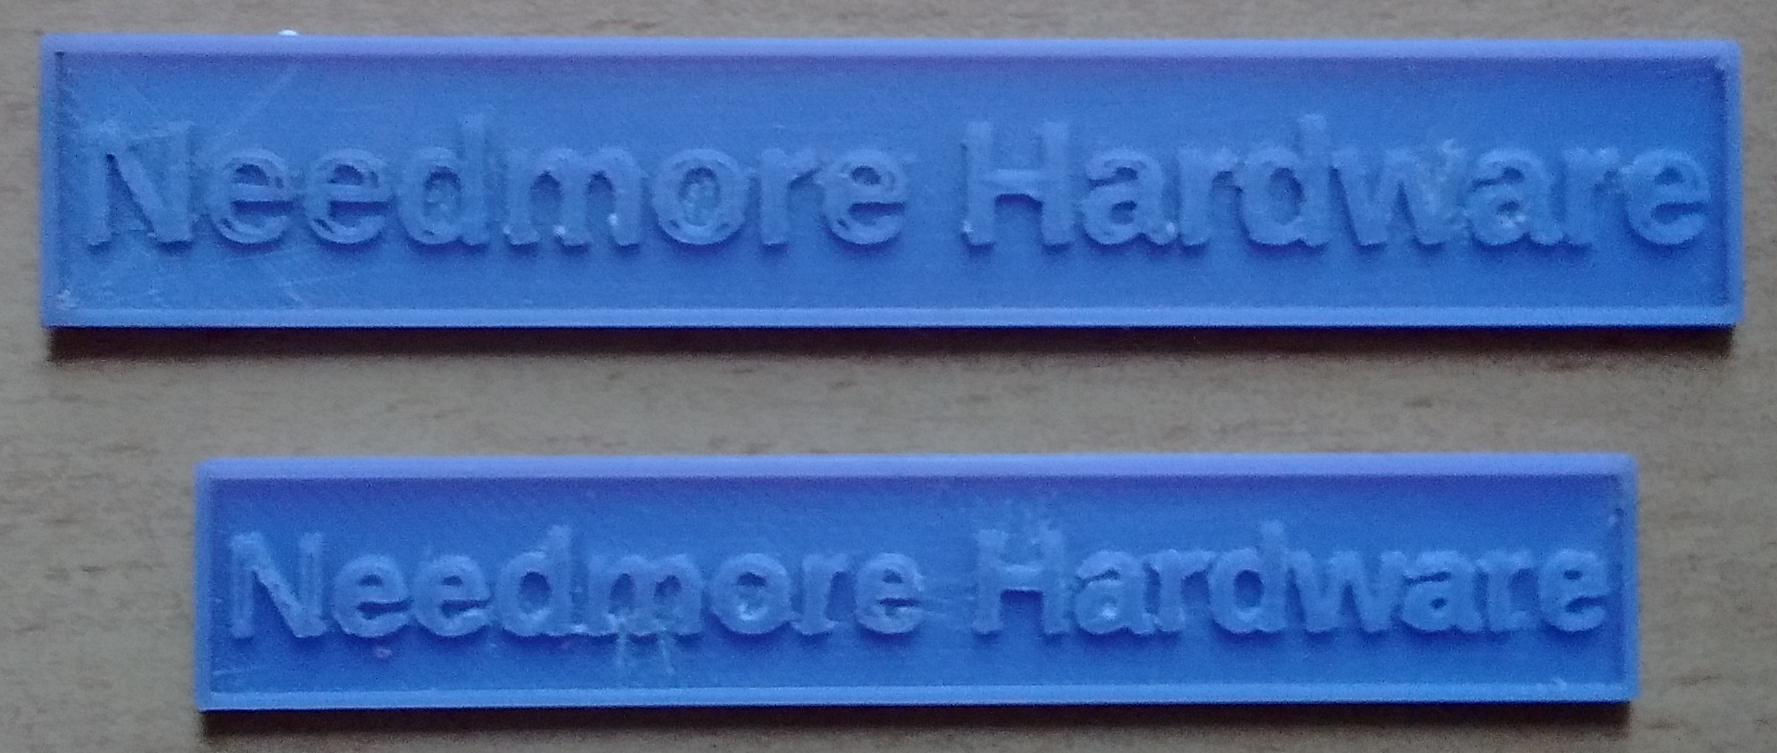 8_Dua_Needmore_HardwareSign